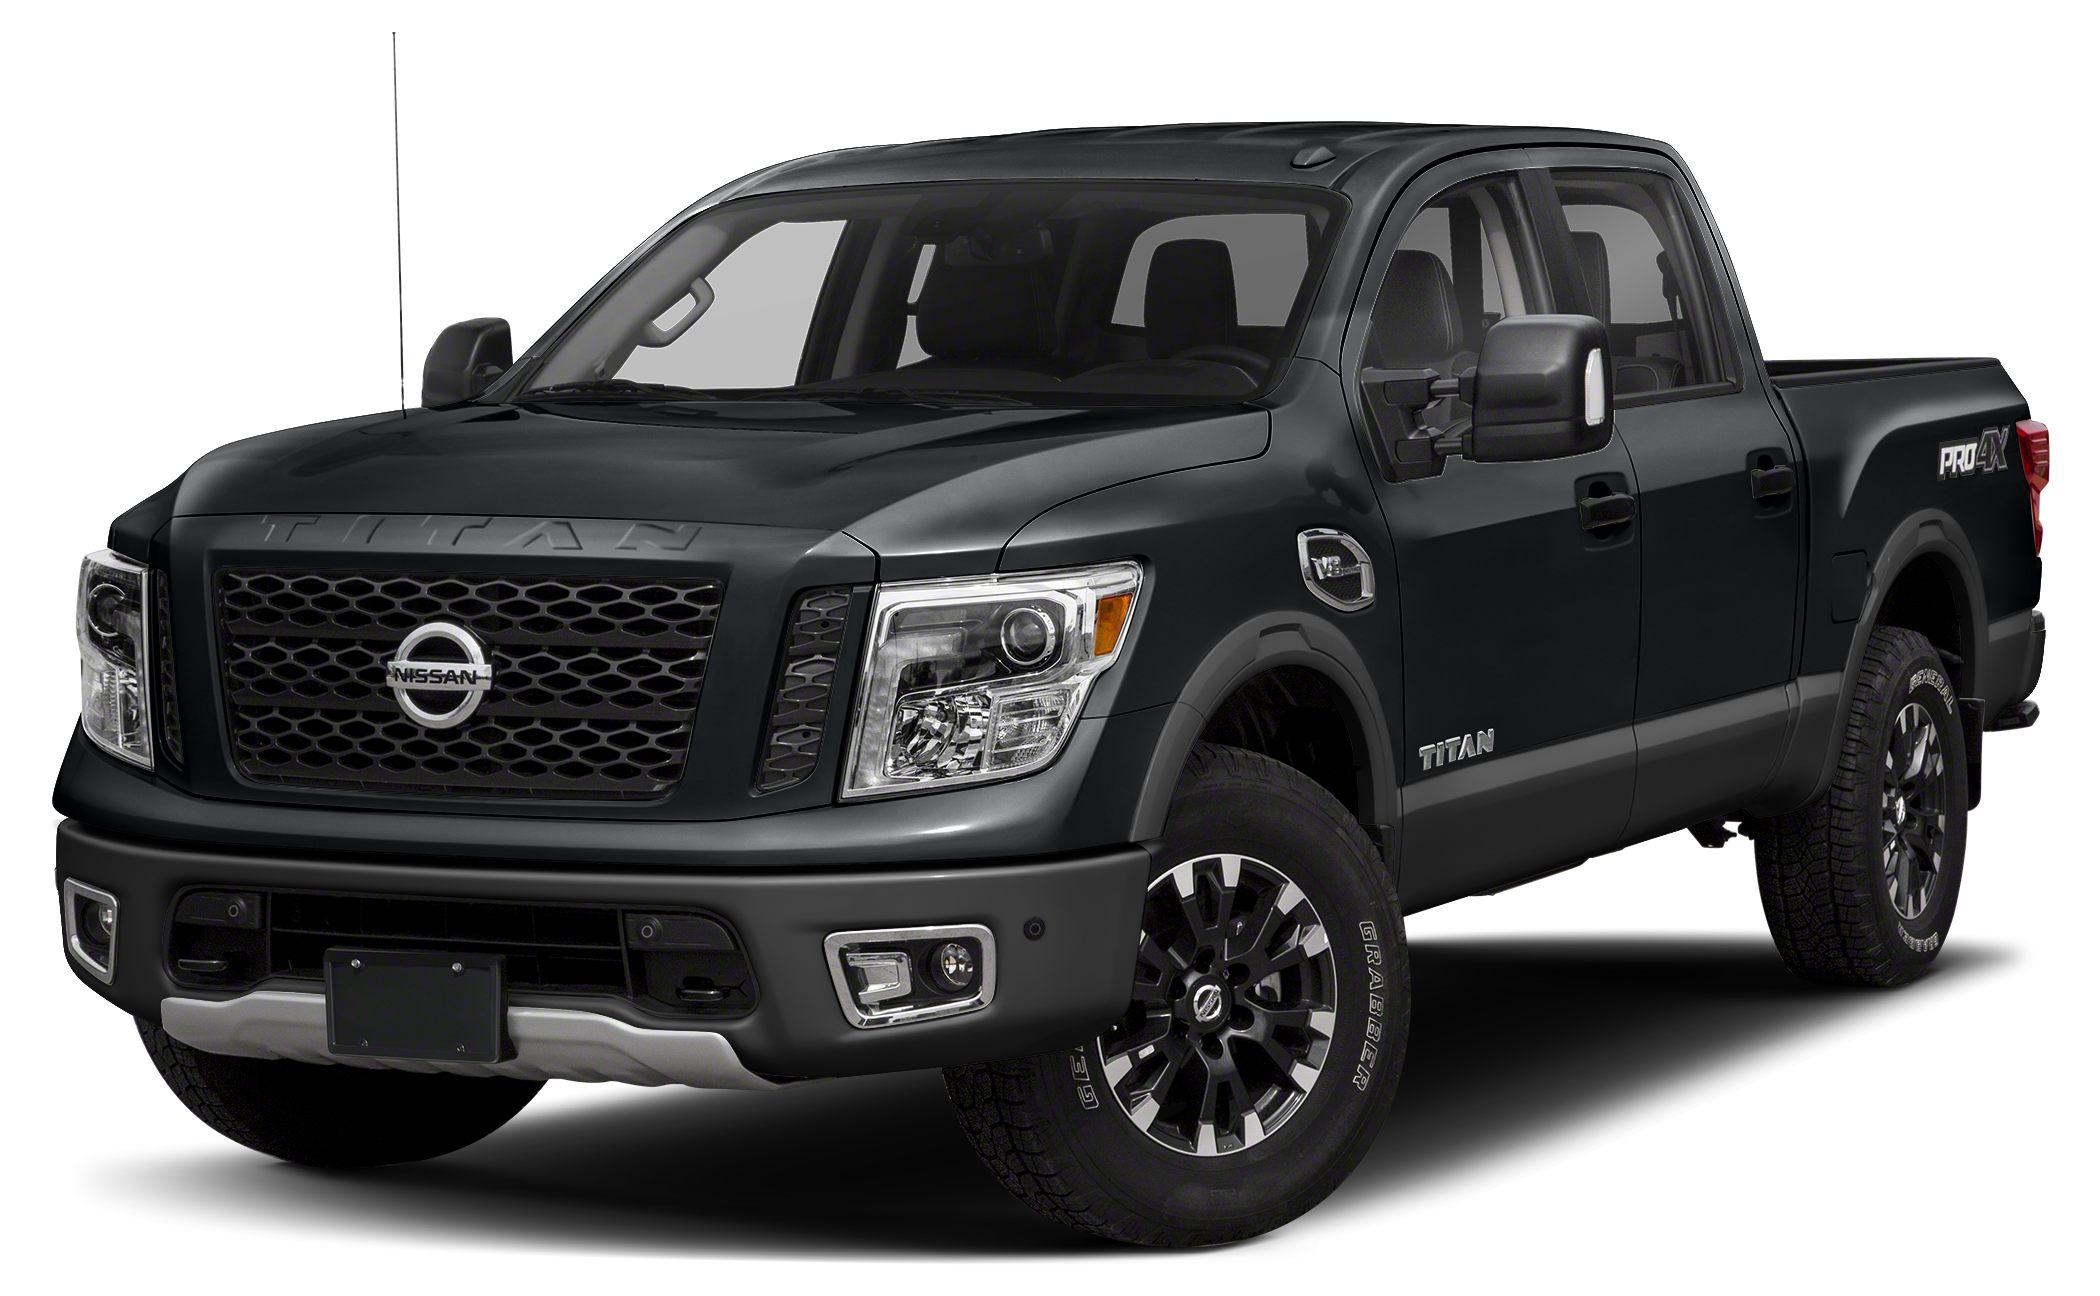 2017 Nissan Titan PRO-4X Navigation Bluetooth This 2017 Nissan Titan PRO-4X is Magnetic Black